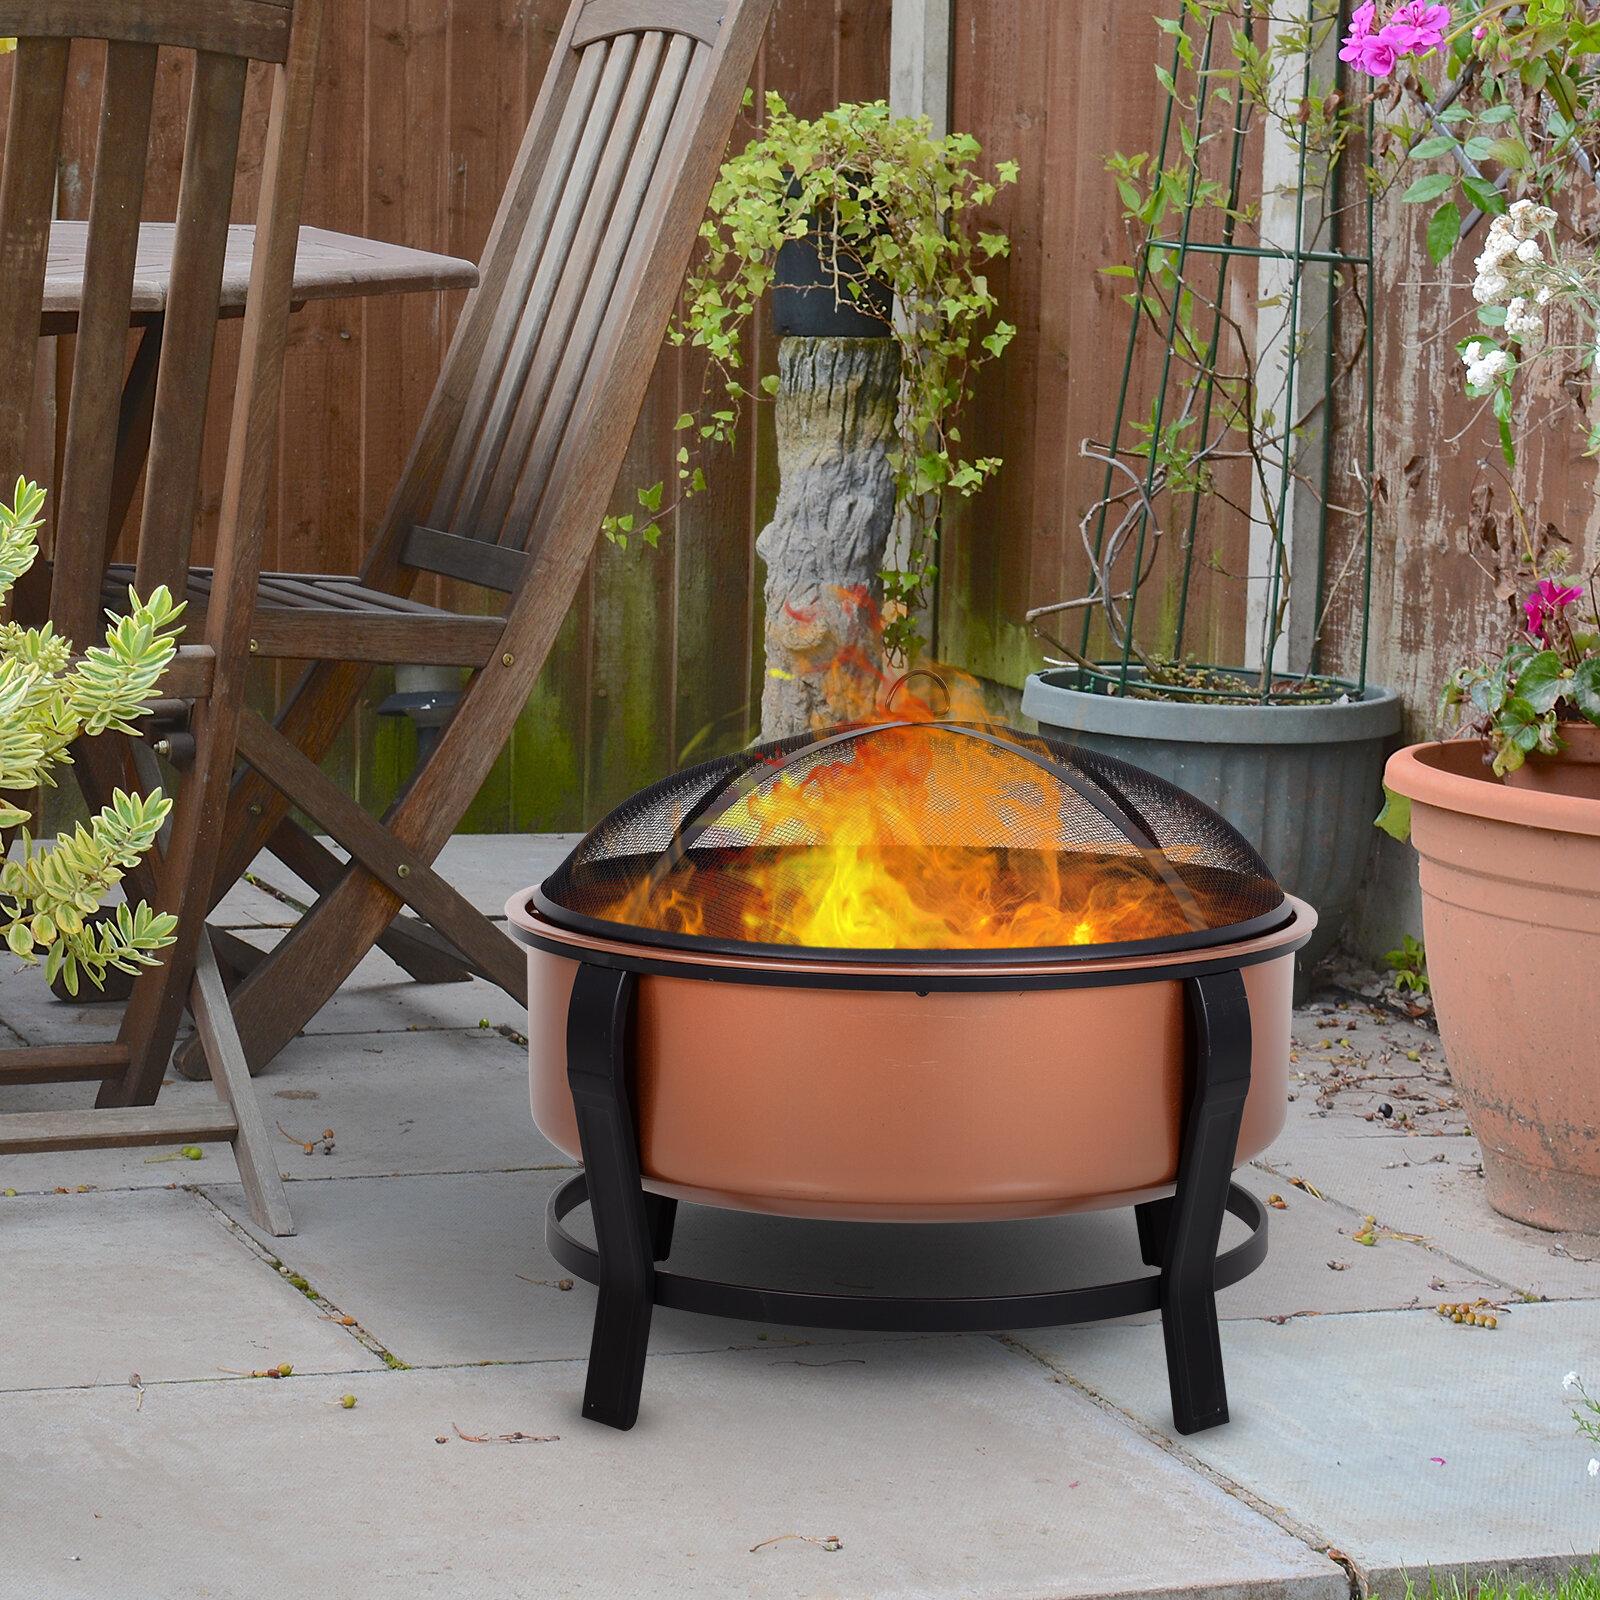 Red Barrel Studio Nerina Steel Wood Burning Fire Pit Reviews Wayfair